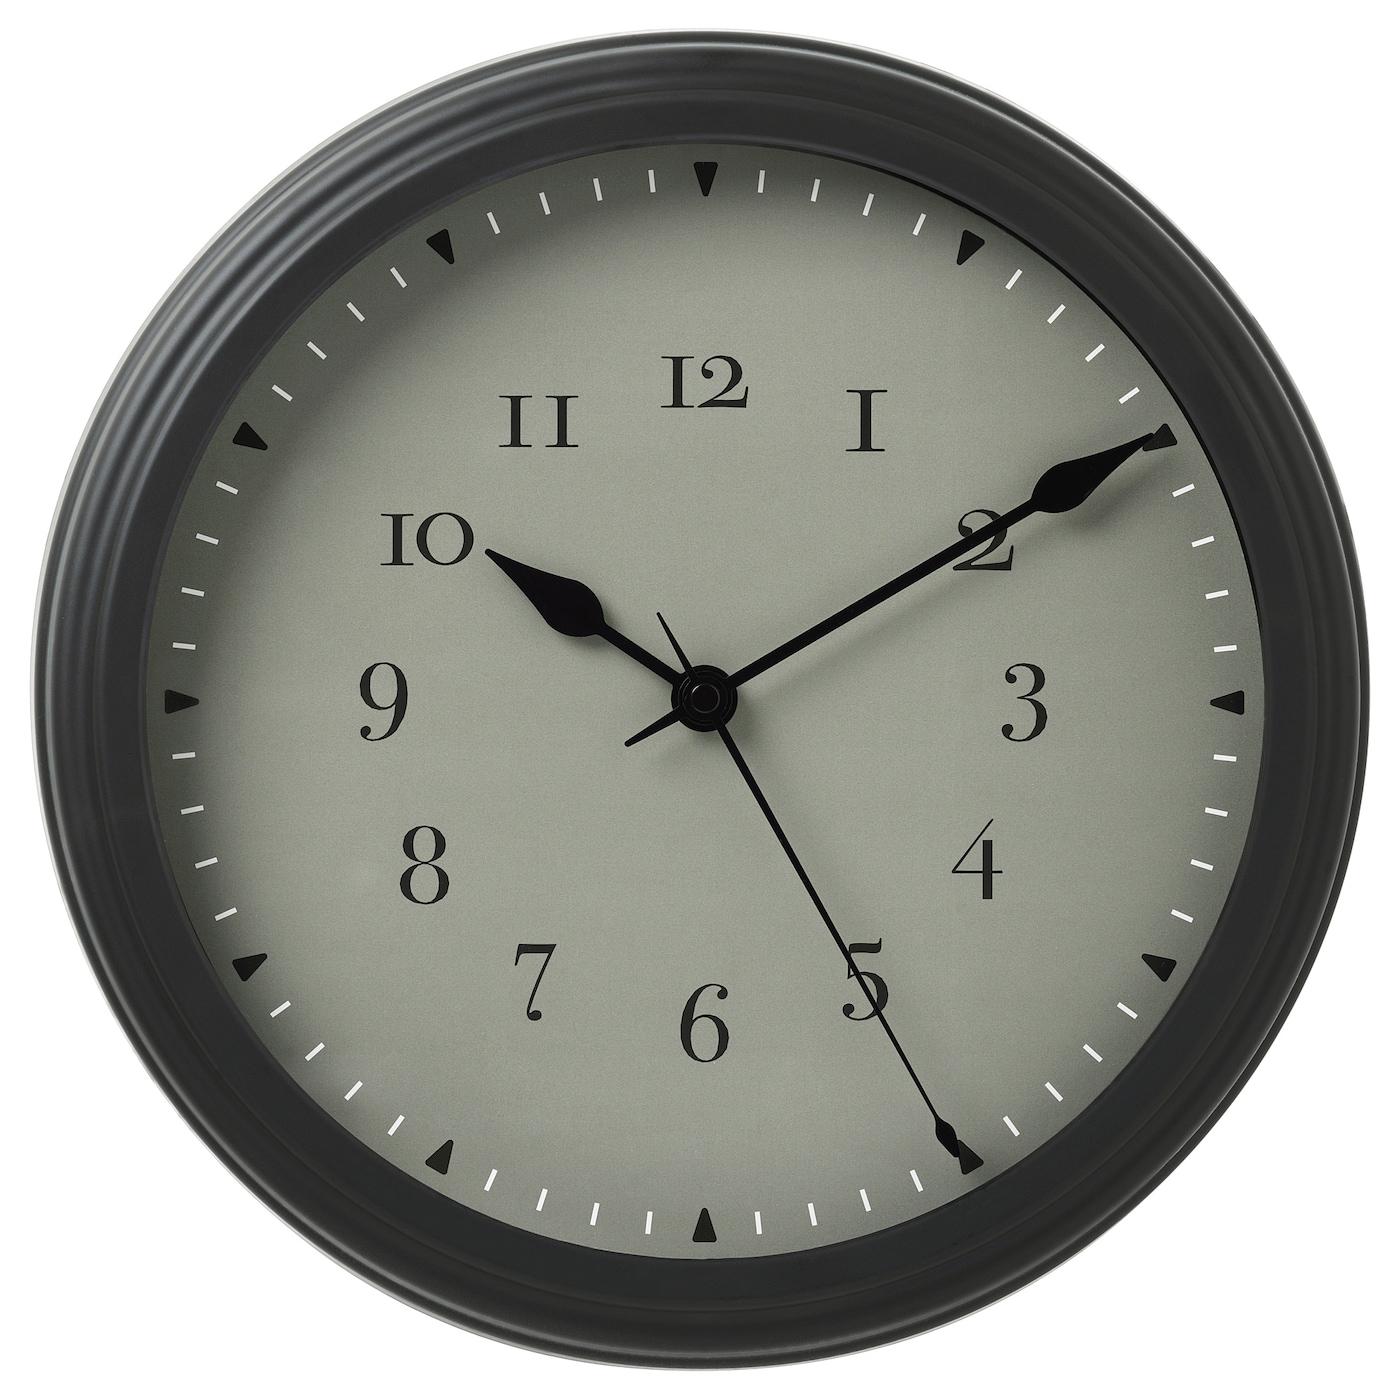 vischan horloge murale 30 cm ikea. Black Bedroom Furniture Sets. Home Design Ideas